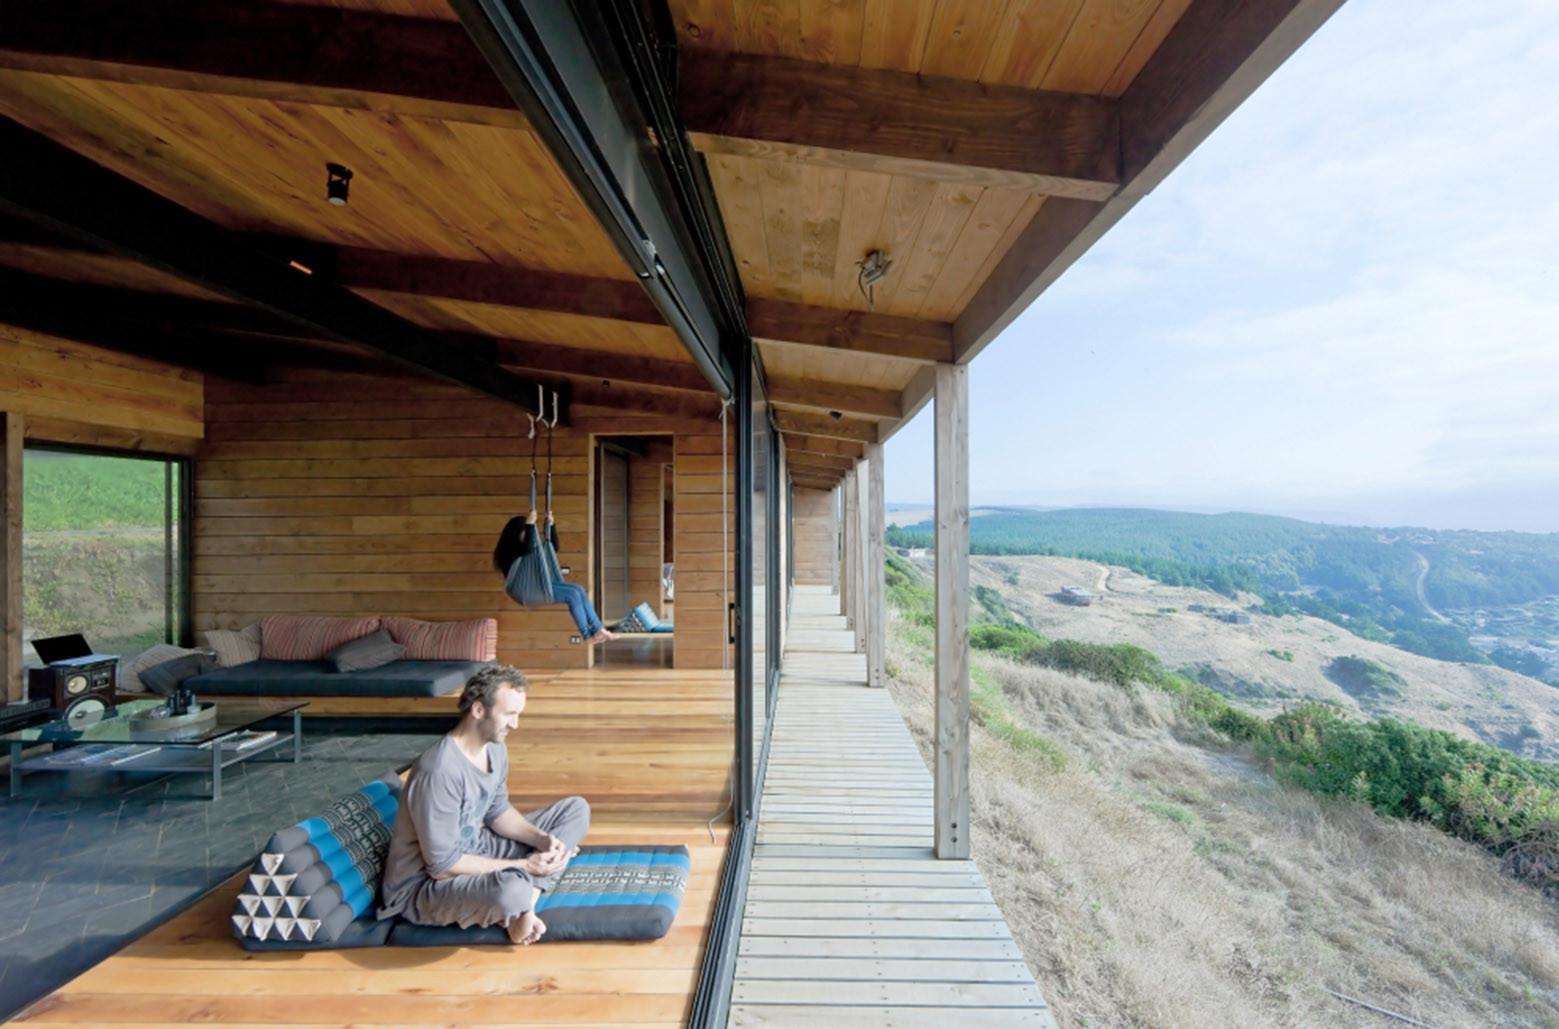 Yoga House / WMR Arquitectos, © Sergio Pirrone